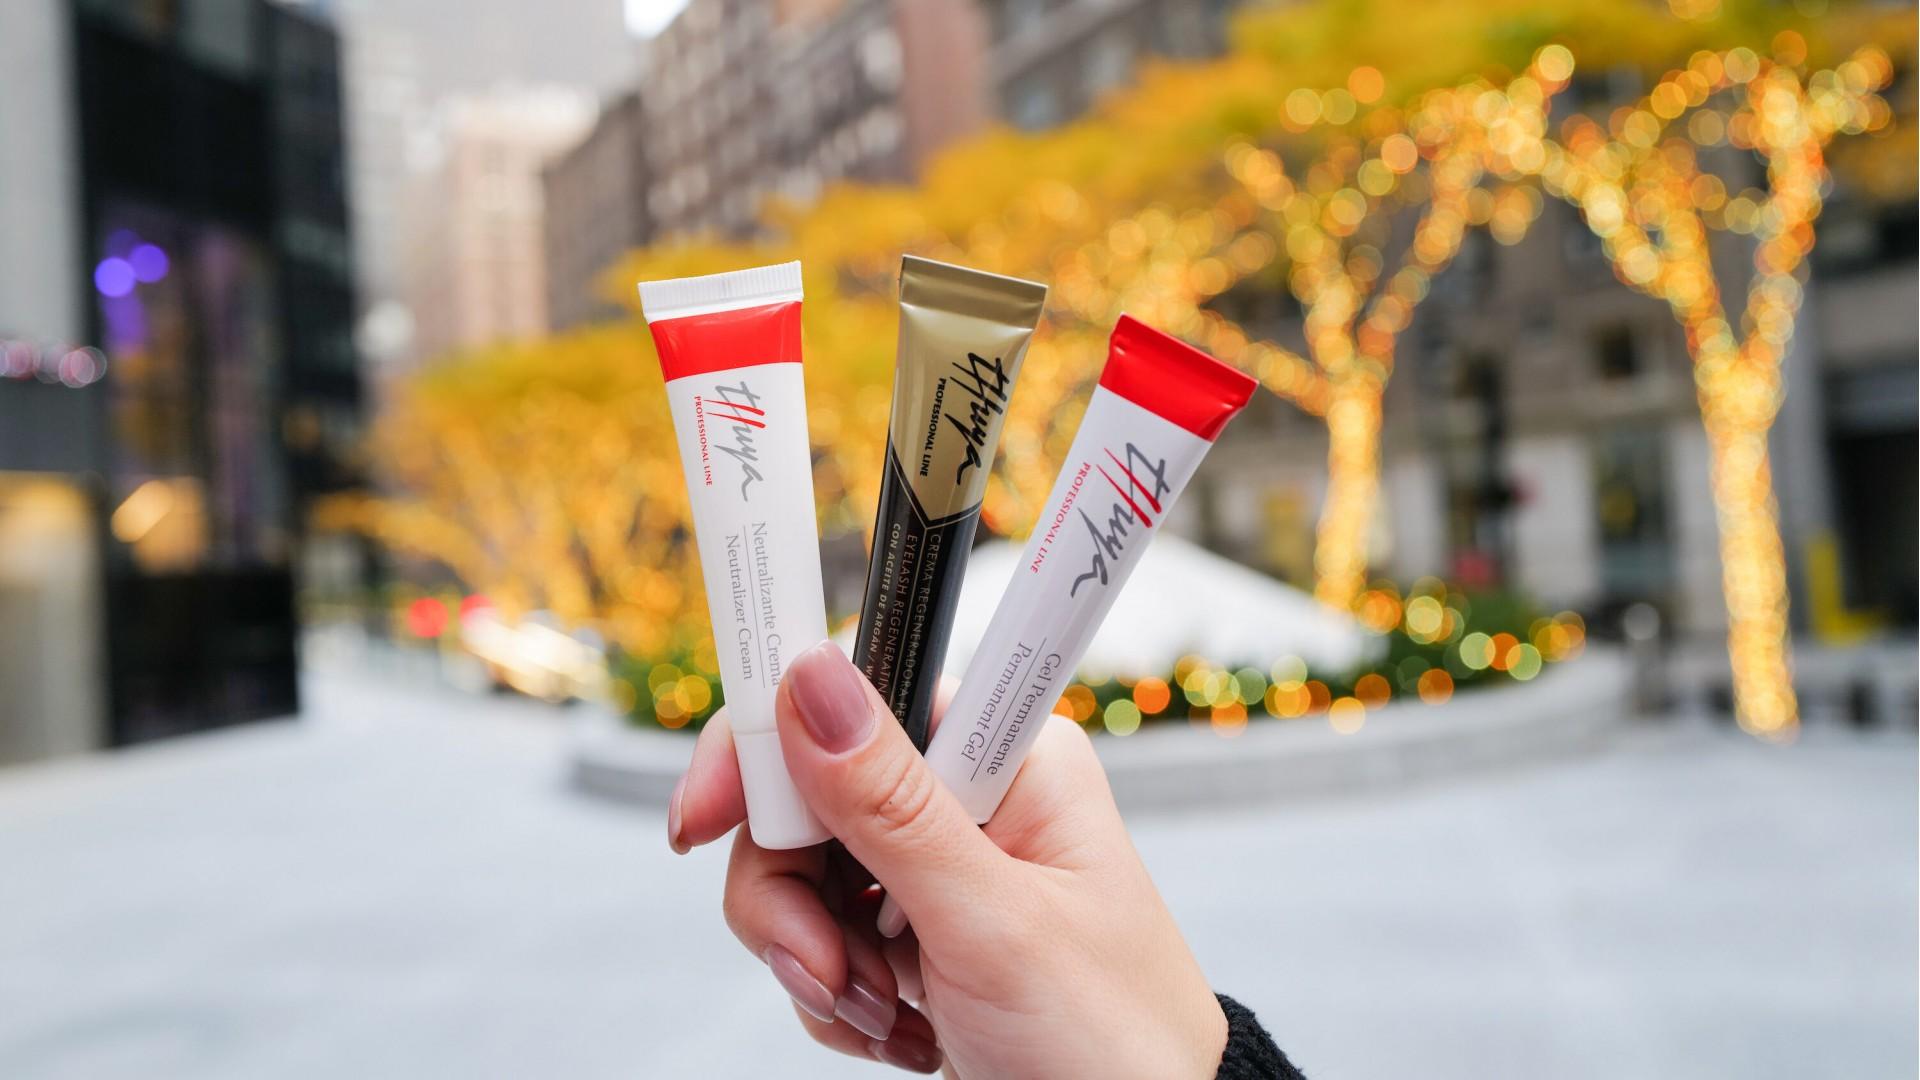 Thuya NYC World's Best Eyebrow Lift Products